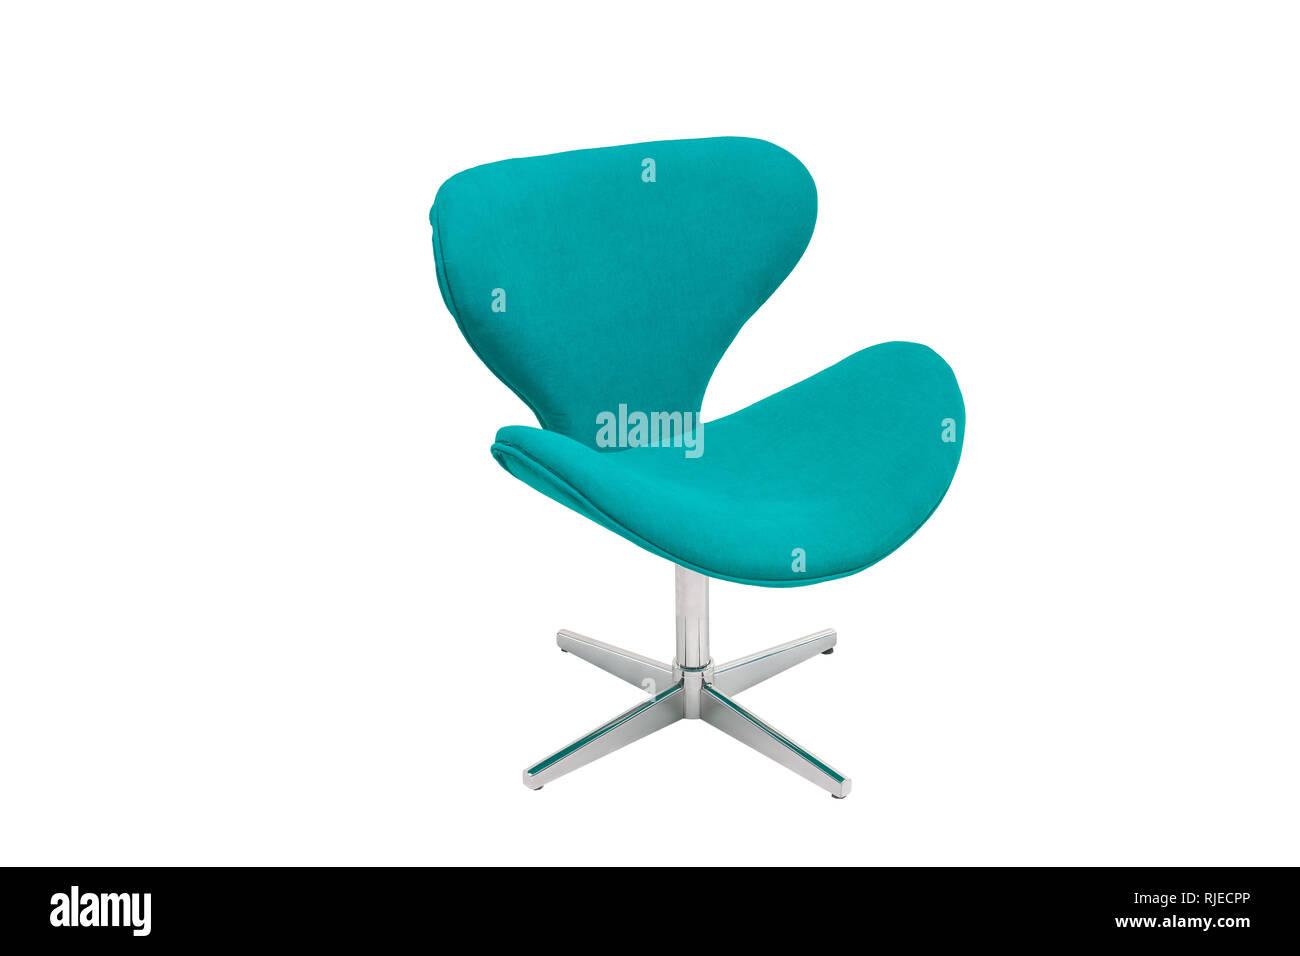 Sensational Red Color Armchair Modern Designer Chair On White Pdpeps Interior Chair Design Pdpepsorg